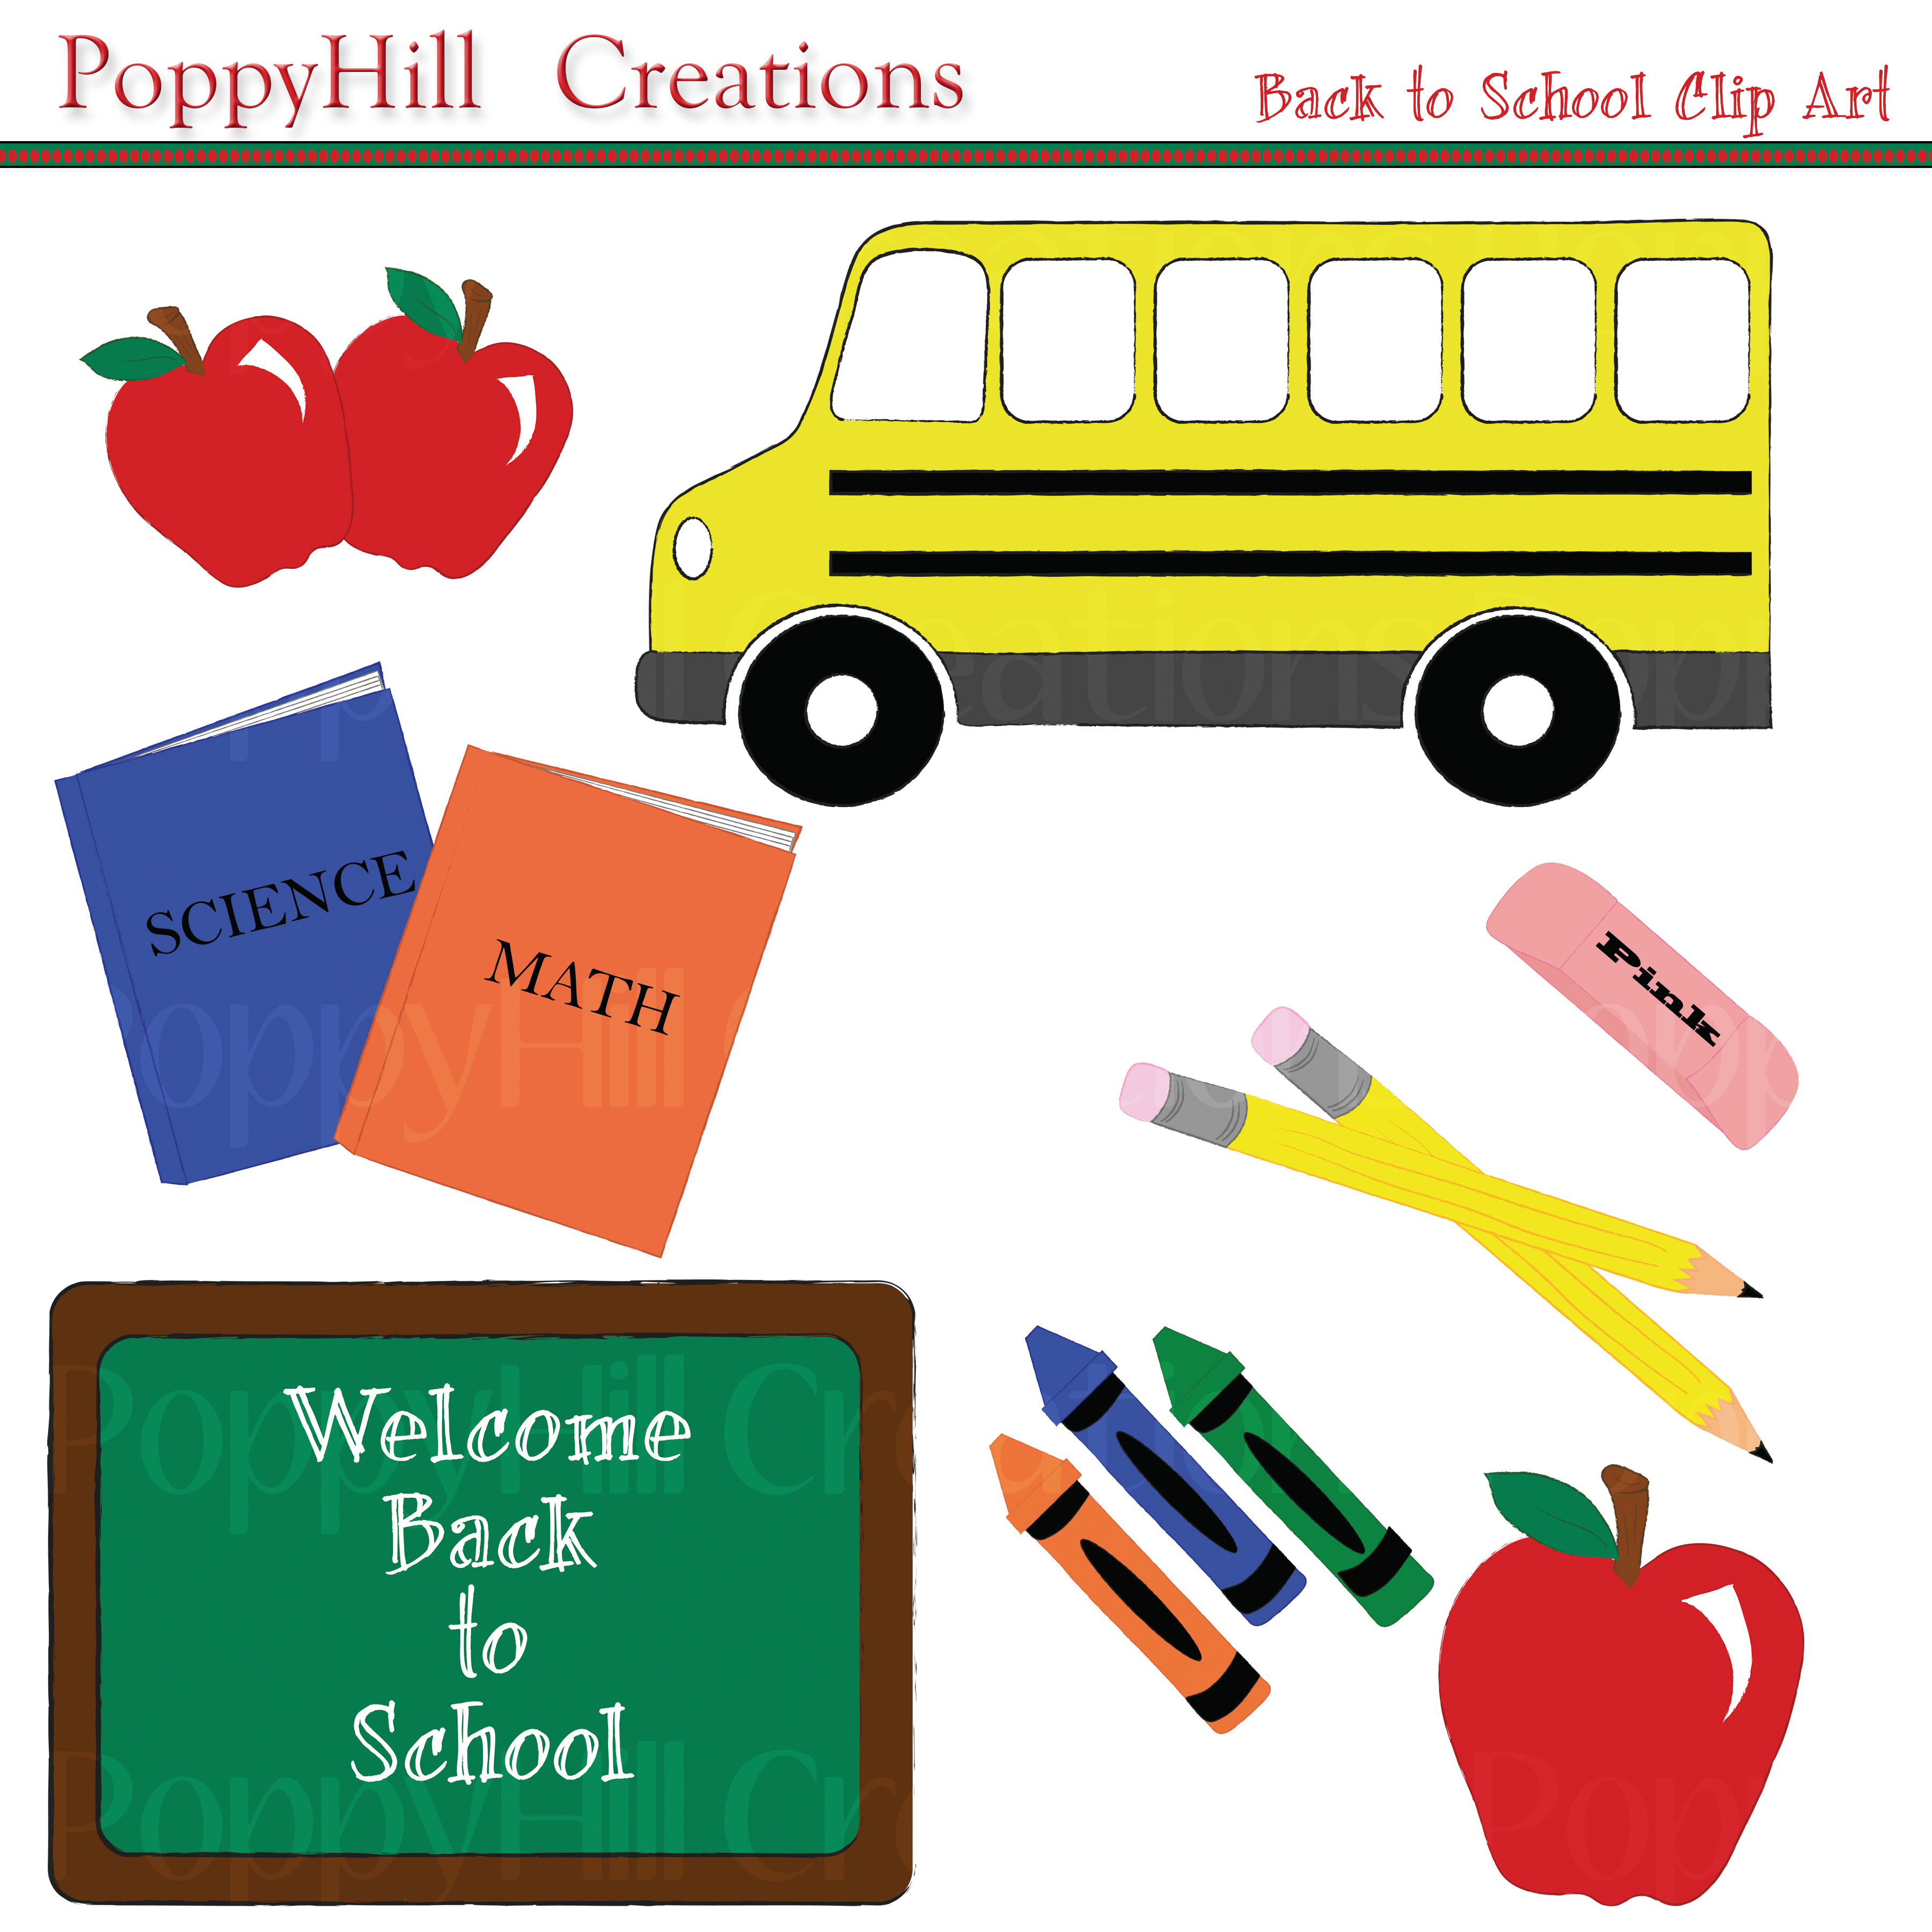 teacher clip art poppyhill creations rh poppyhillcreations com Teacher Christmas Clip Art digital clipart for teachers